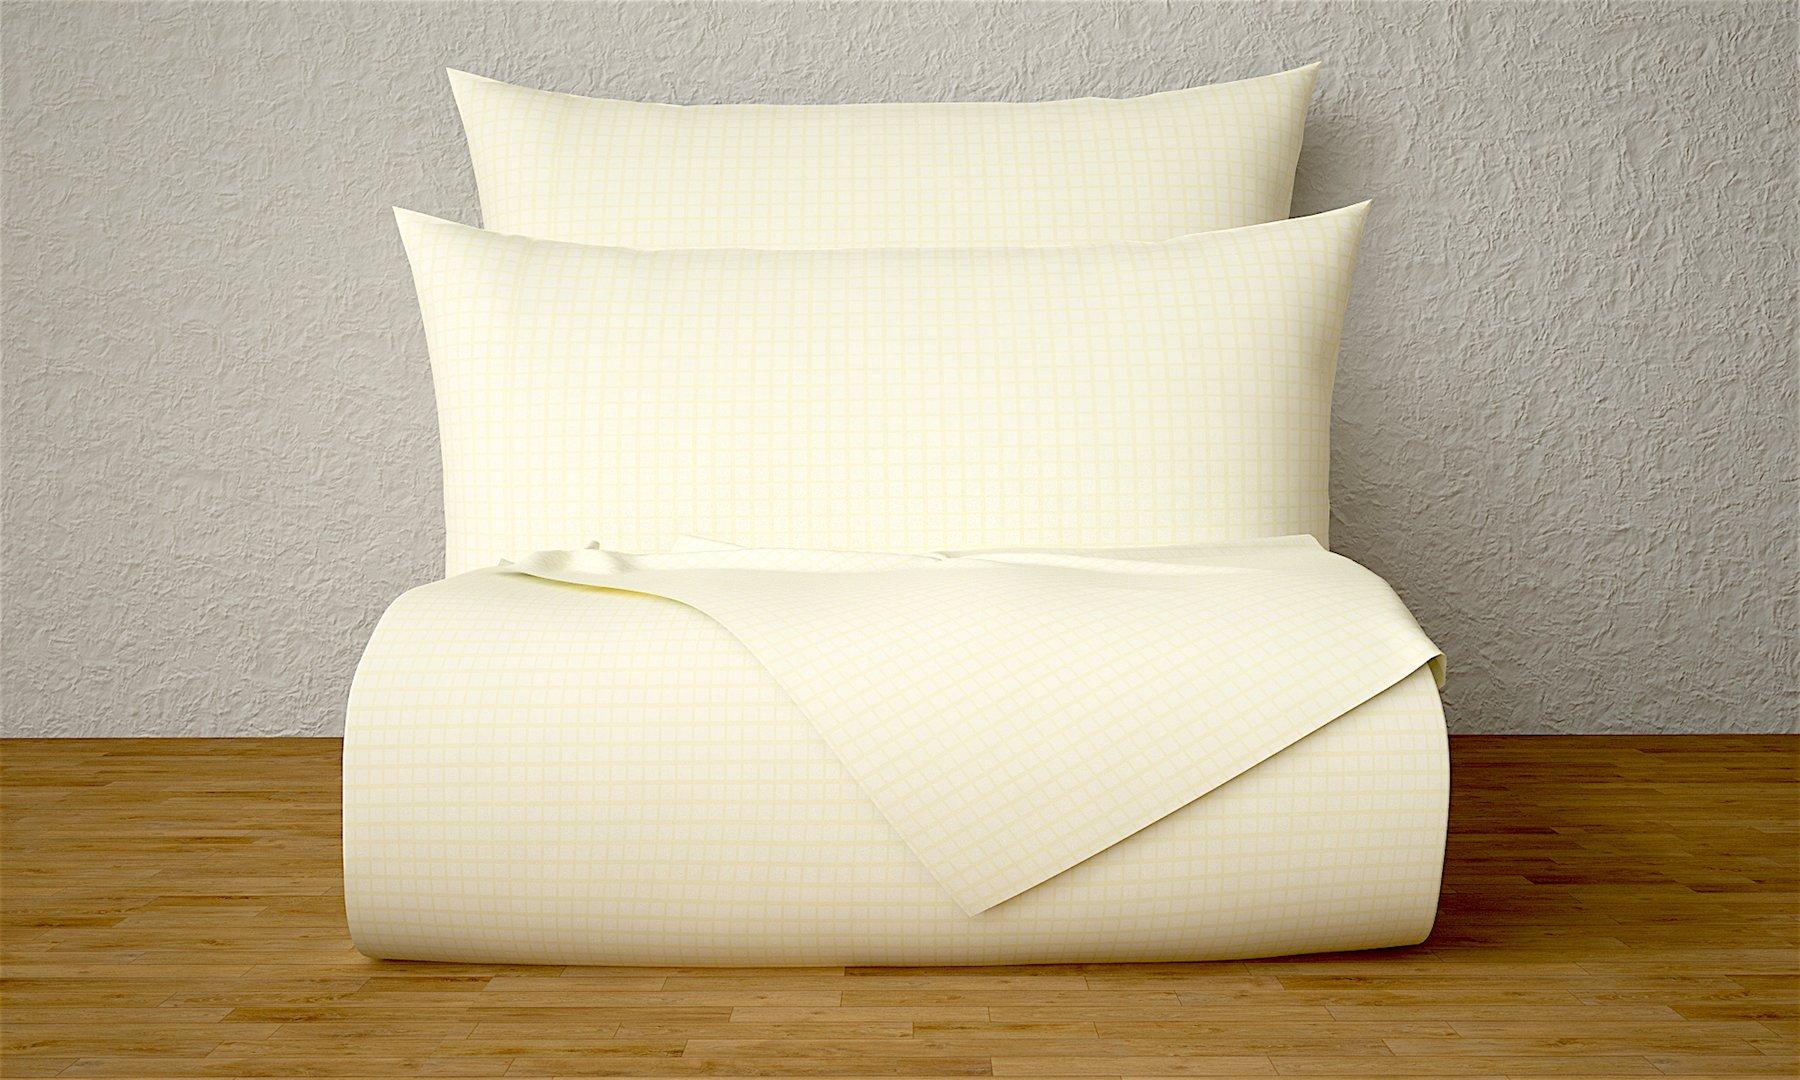 Livingston Home Xara Luxury 33227 3 Piece Window Pane 1800 Series Printed Cotton Essential Embossed Tone on Tone Bed Sheet Set, Twin, Cream